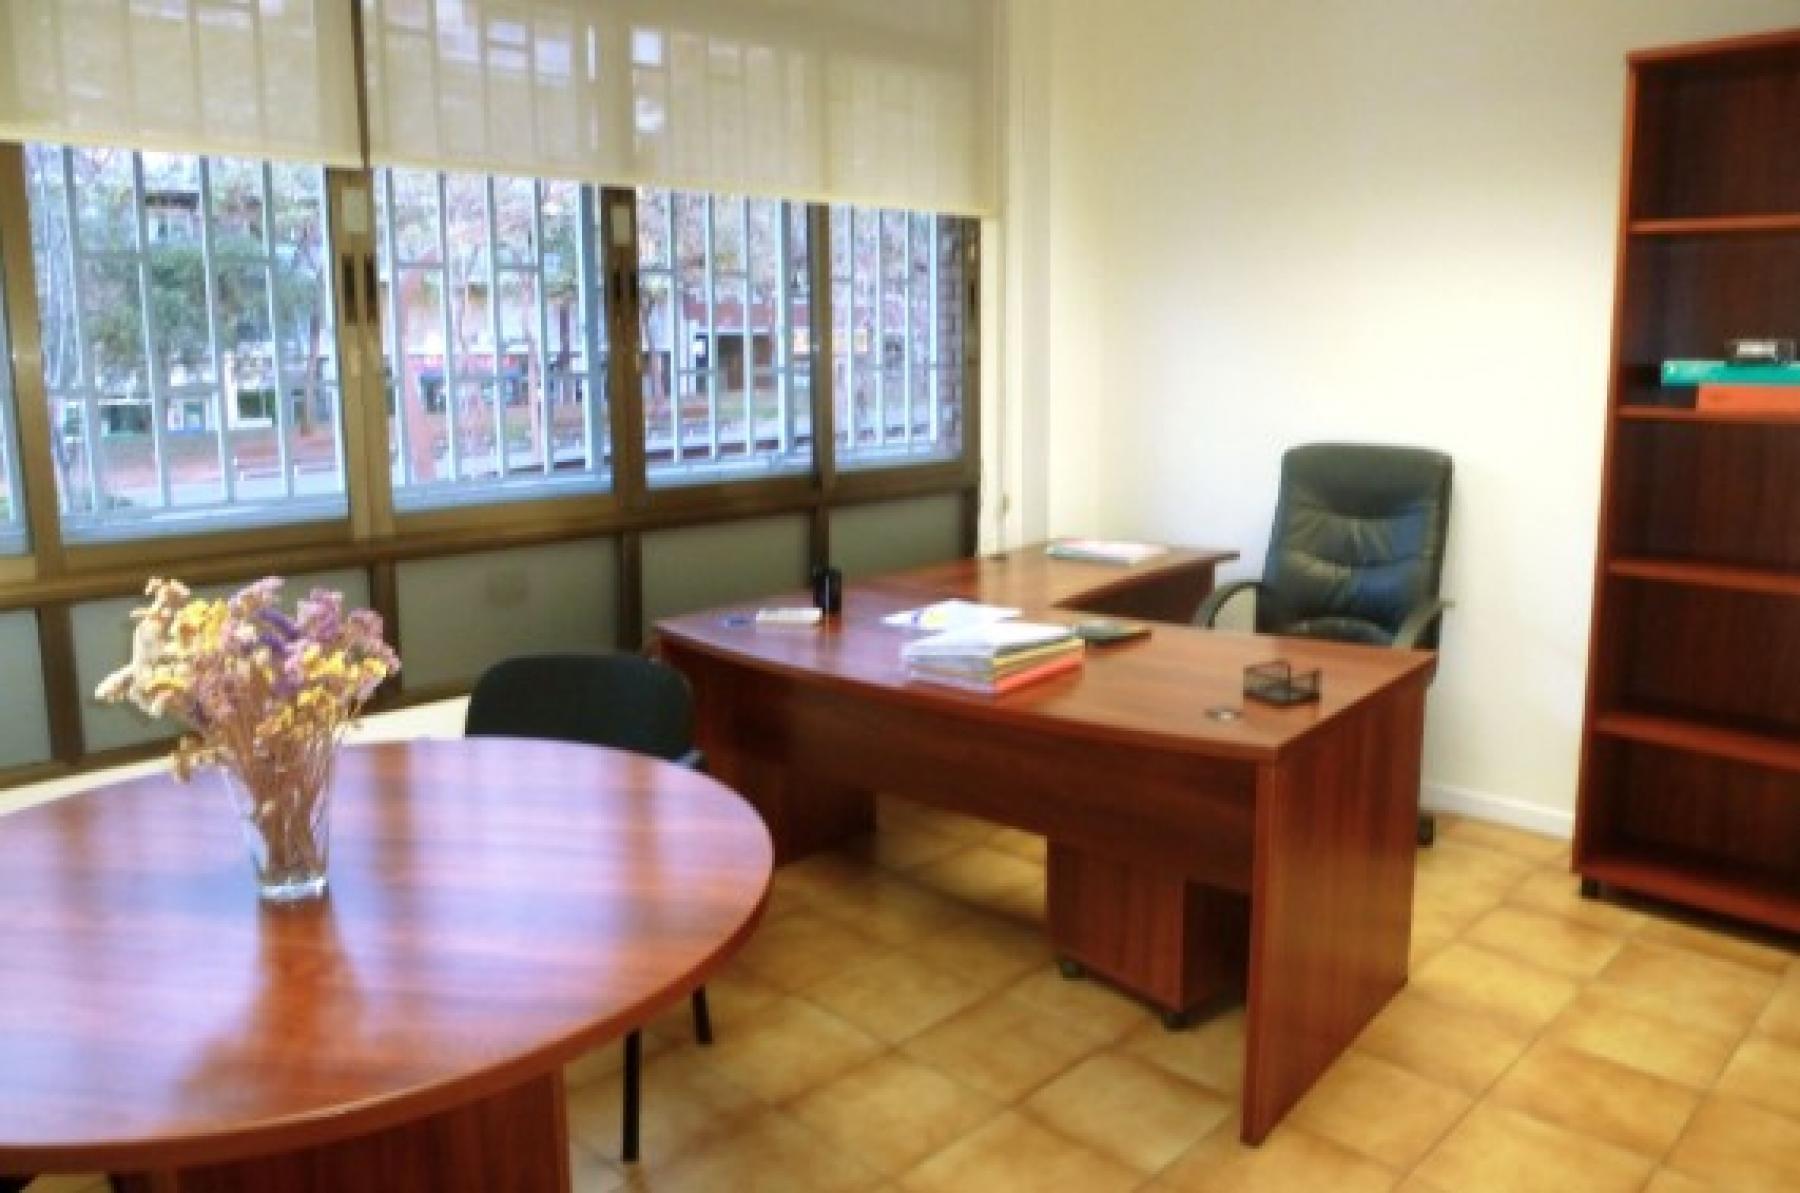 Alquilar oficinas Rambla del Brasil 28-30, Barcelona (5)